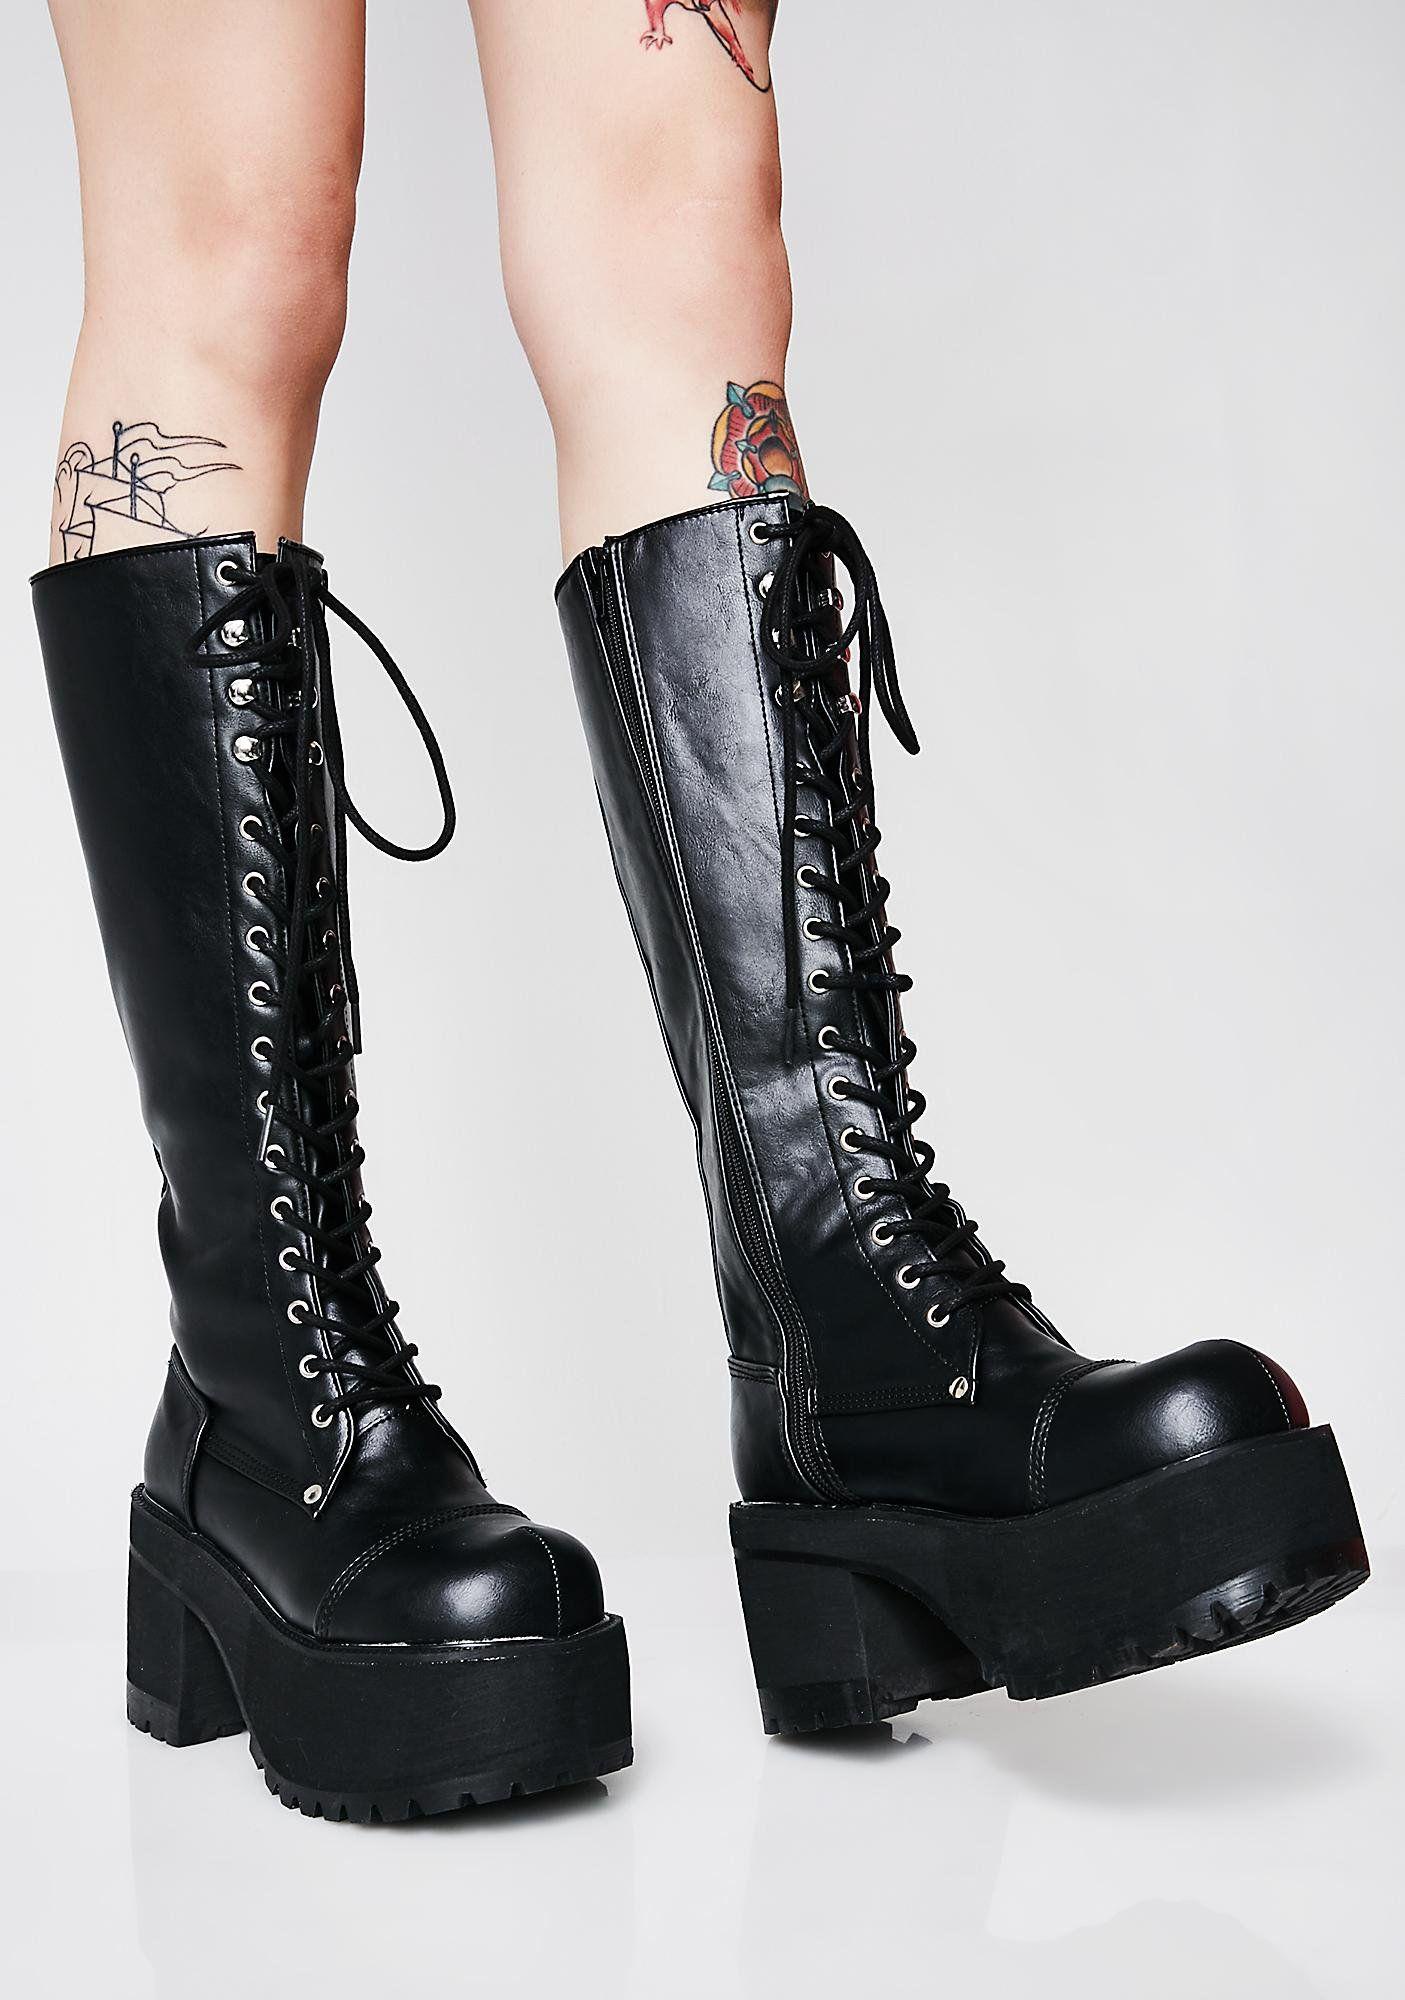 ce562fbb689 Demonia Lurkin  On Ya Platform Boots will have ya feelin  like a yung  frankenqueen